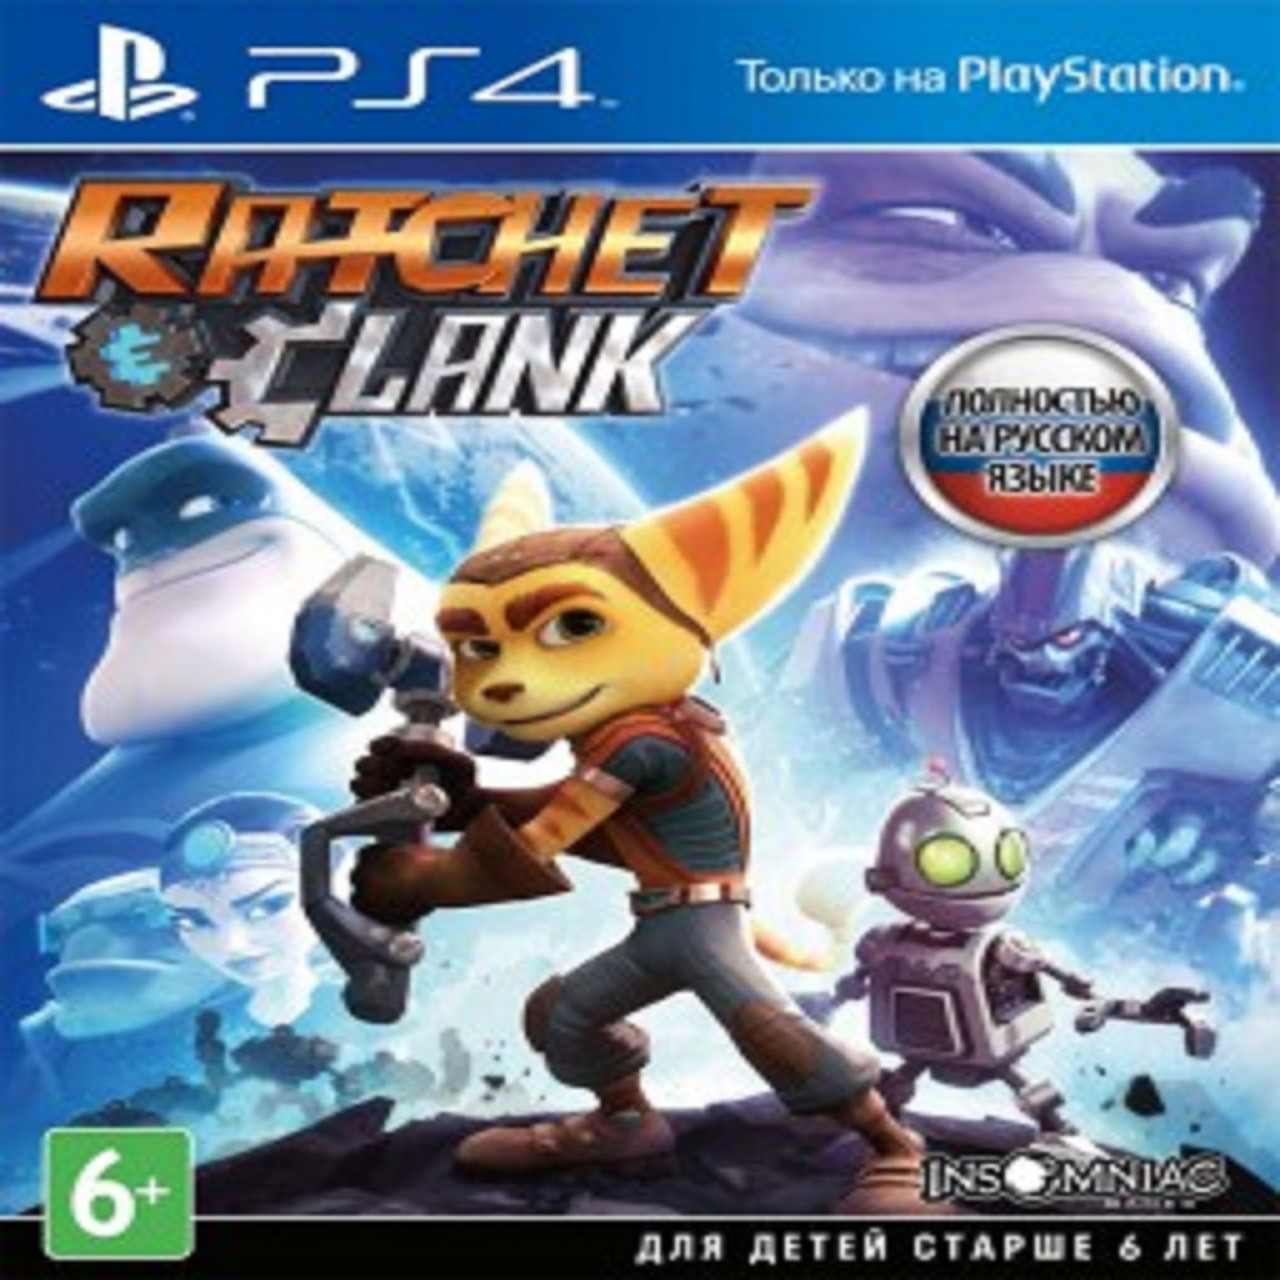 Ratchet & Clank RUS PS4